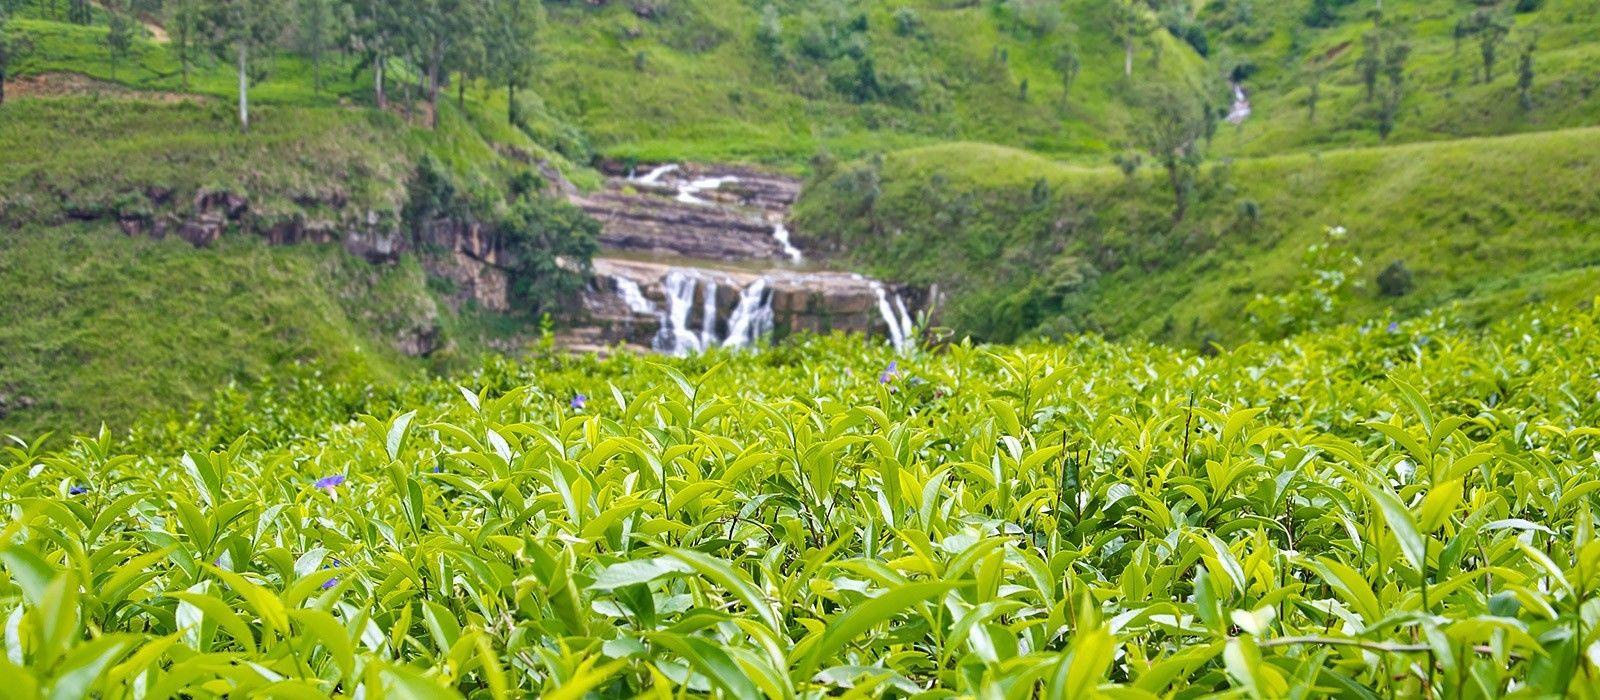 Culture and Beach Wonders of Sri Lanka Tour Trip 4